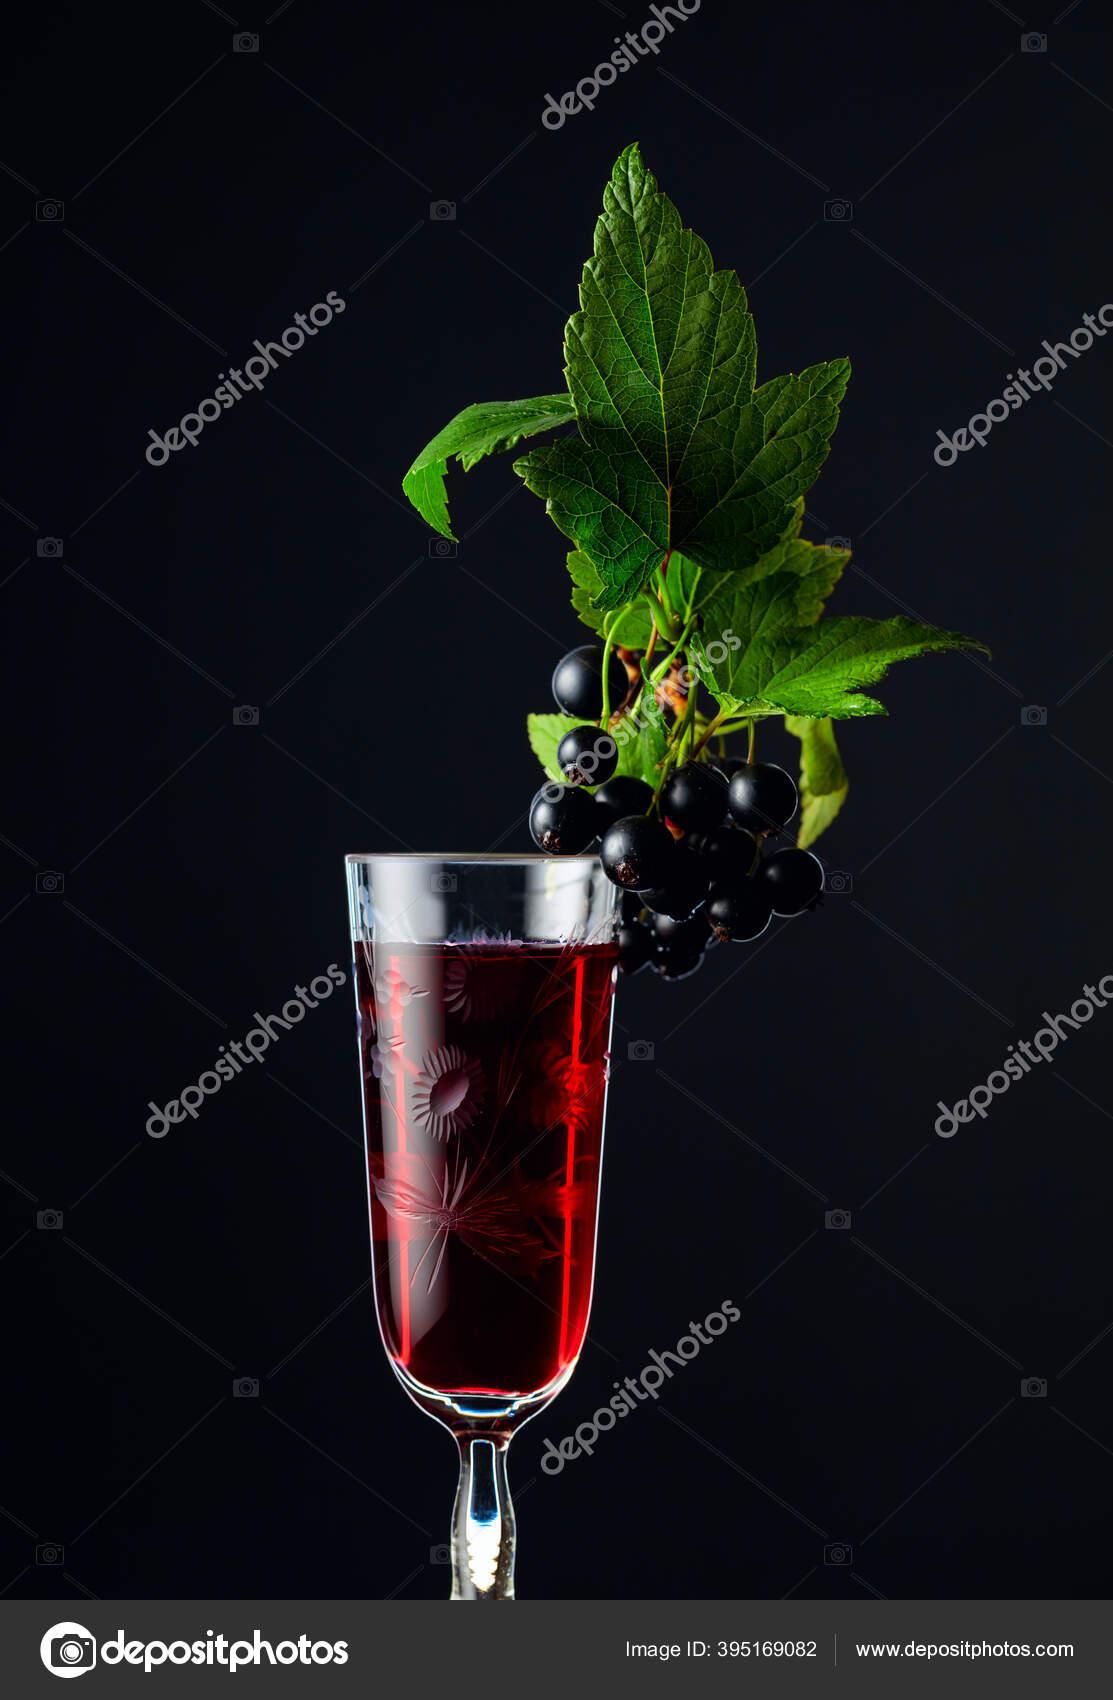 st4.depositphotos.com/1007248/39516/i/1600/depositphotos_395169082-stock-photo-glass-blackcurrant-liqueur-syrup-sweet.jpg